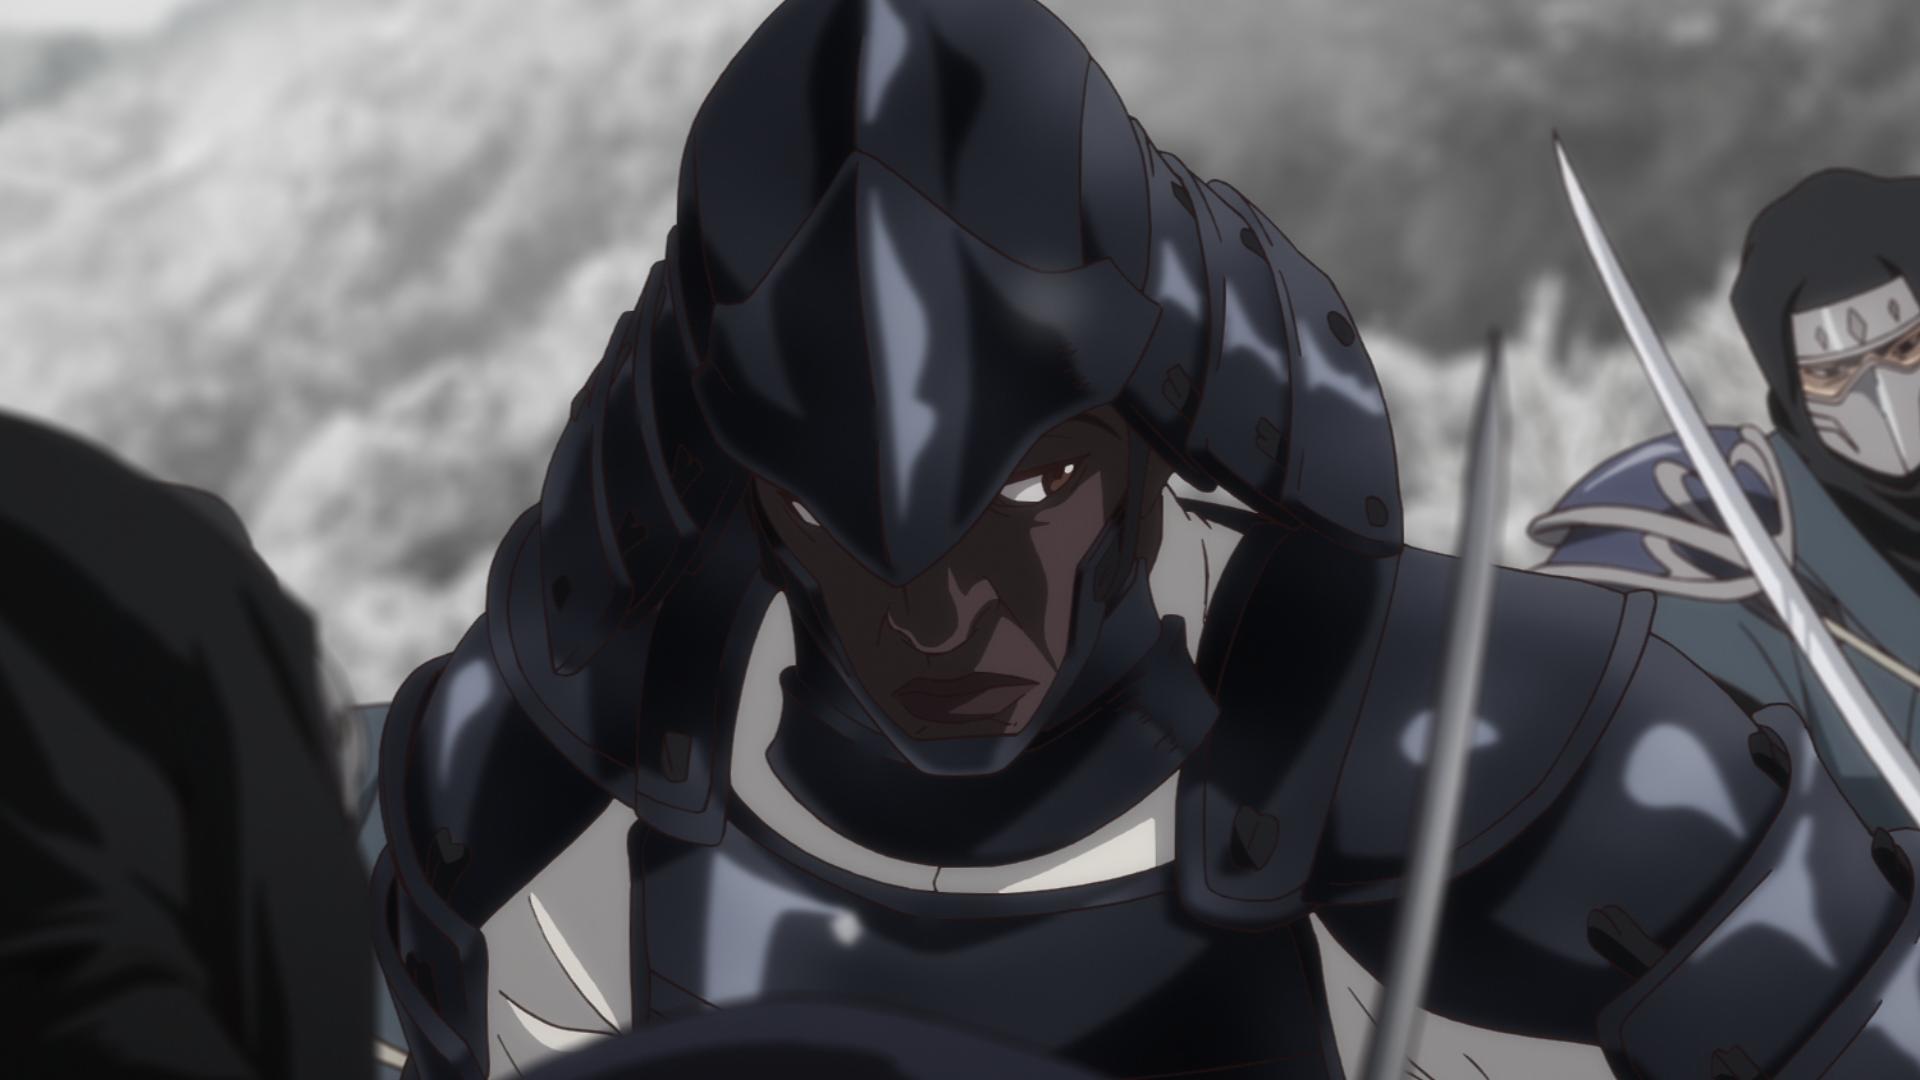 Yasuke' Trailer: Netflix Anime ft LaKeith Stanfield as Black Samurai |  IndieWire